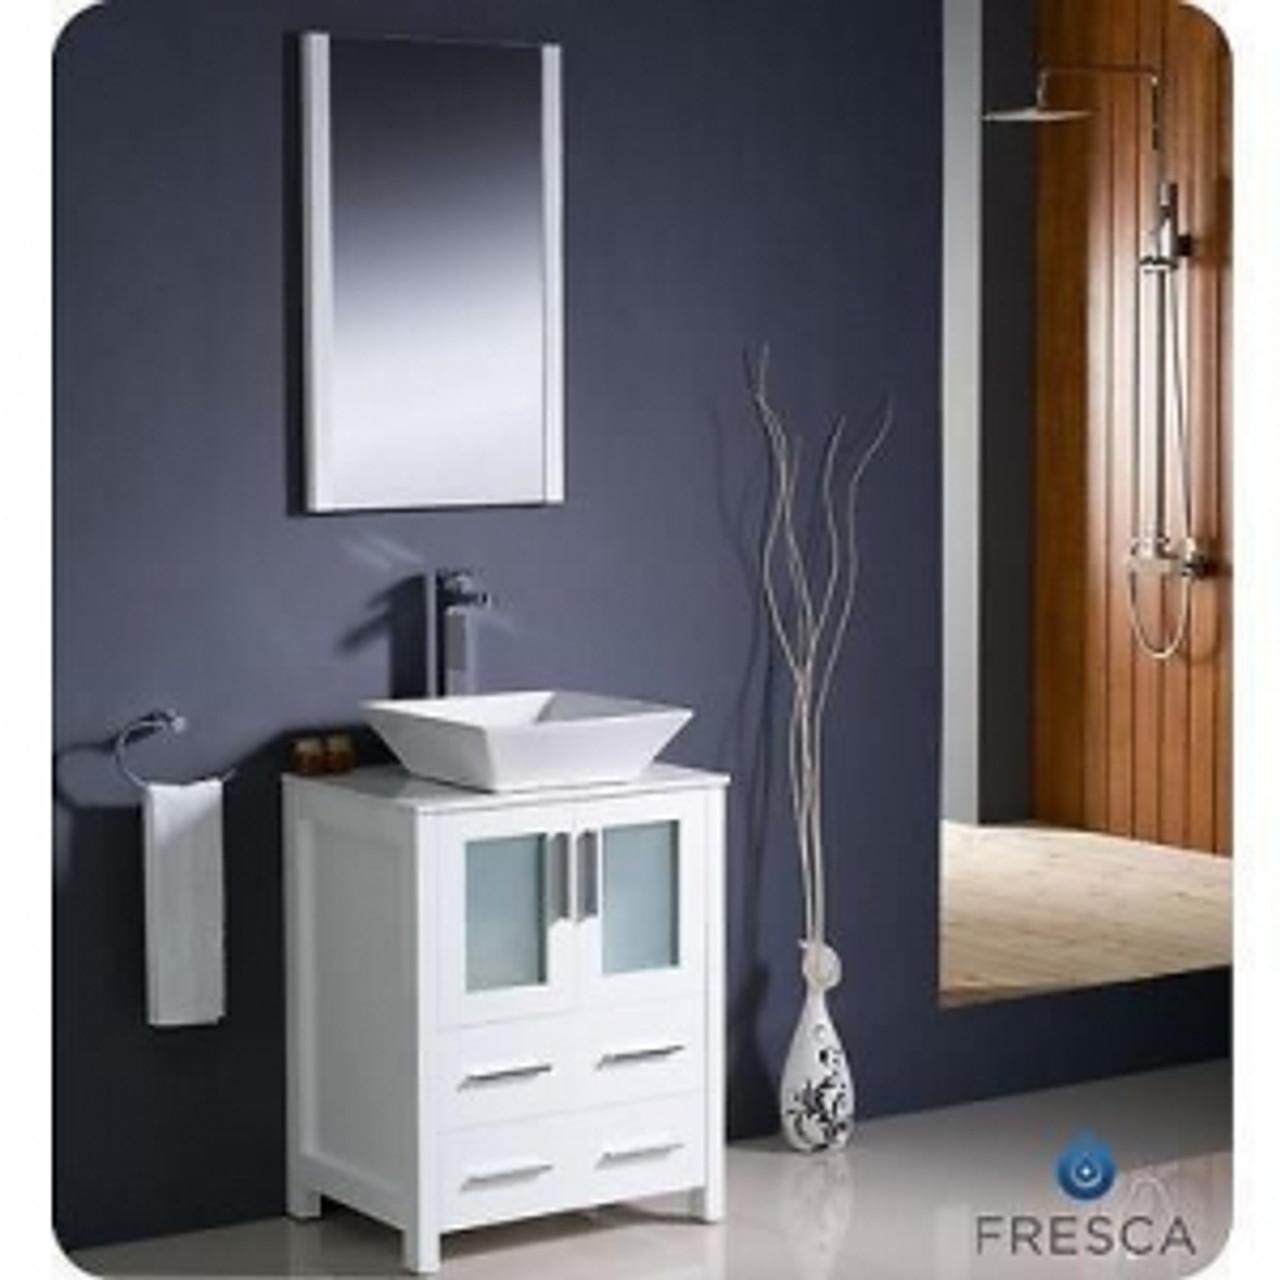 Vaughn 24 Bathroom Vanity White Without Top York Taps